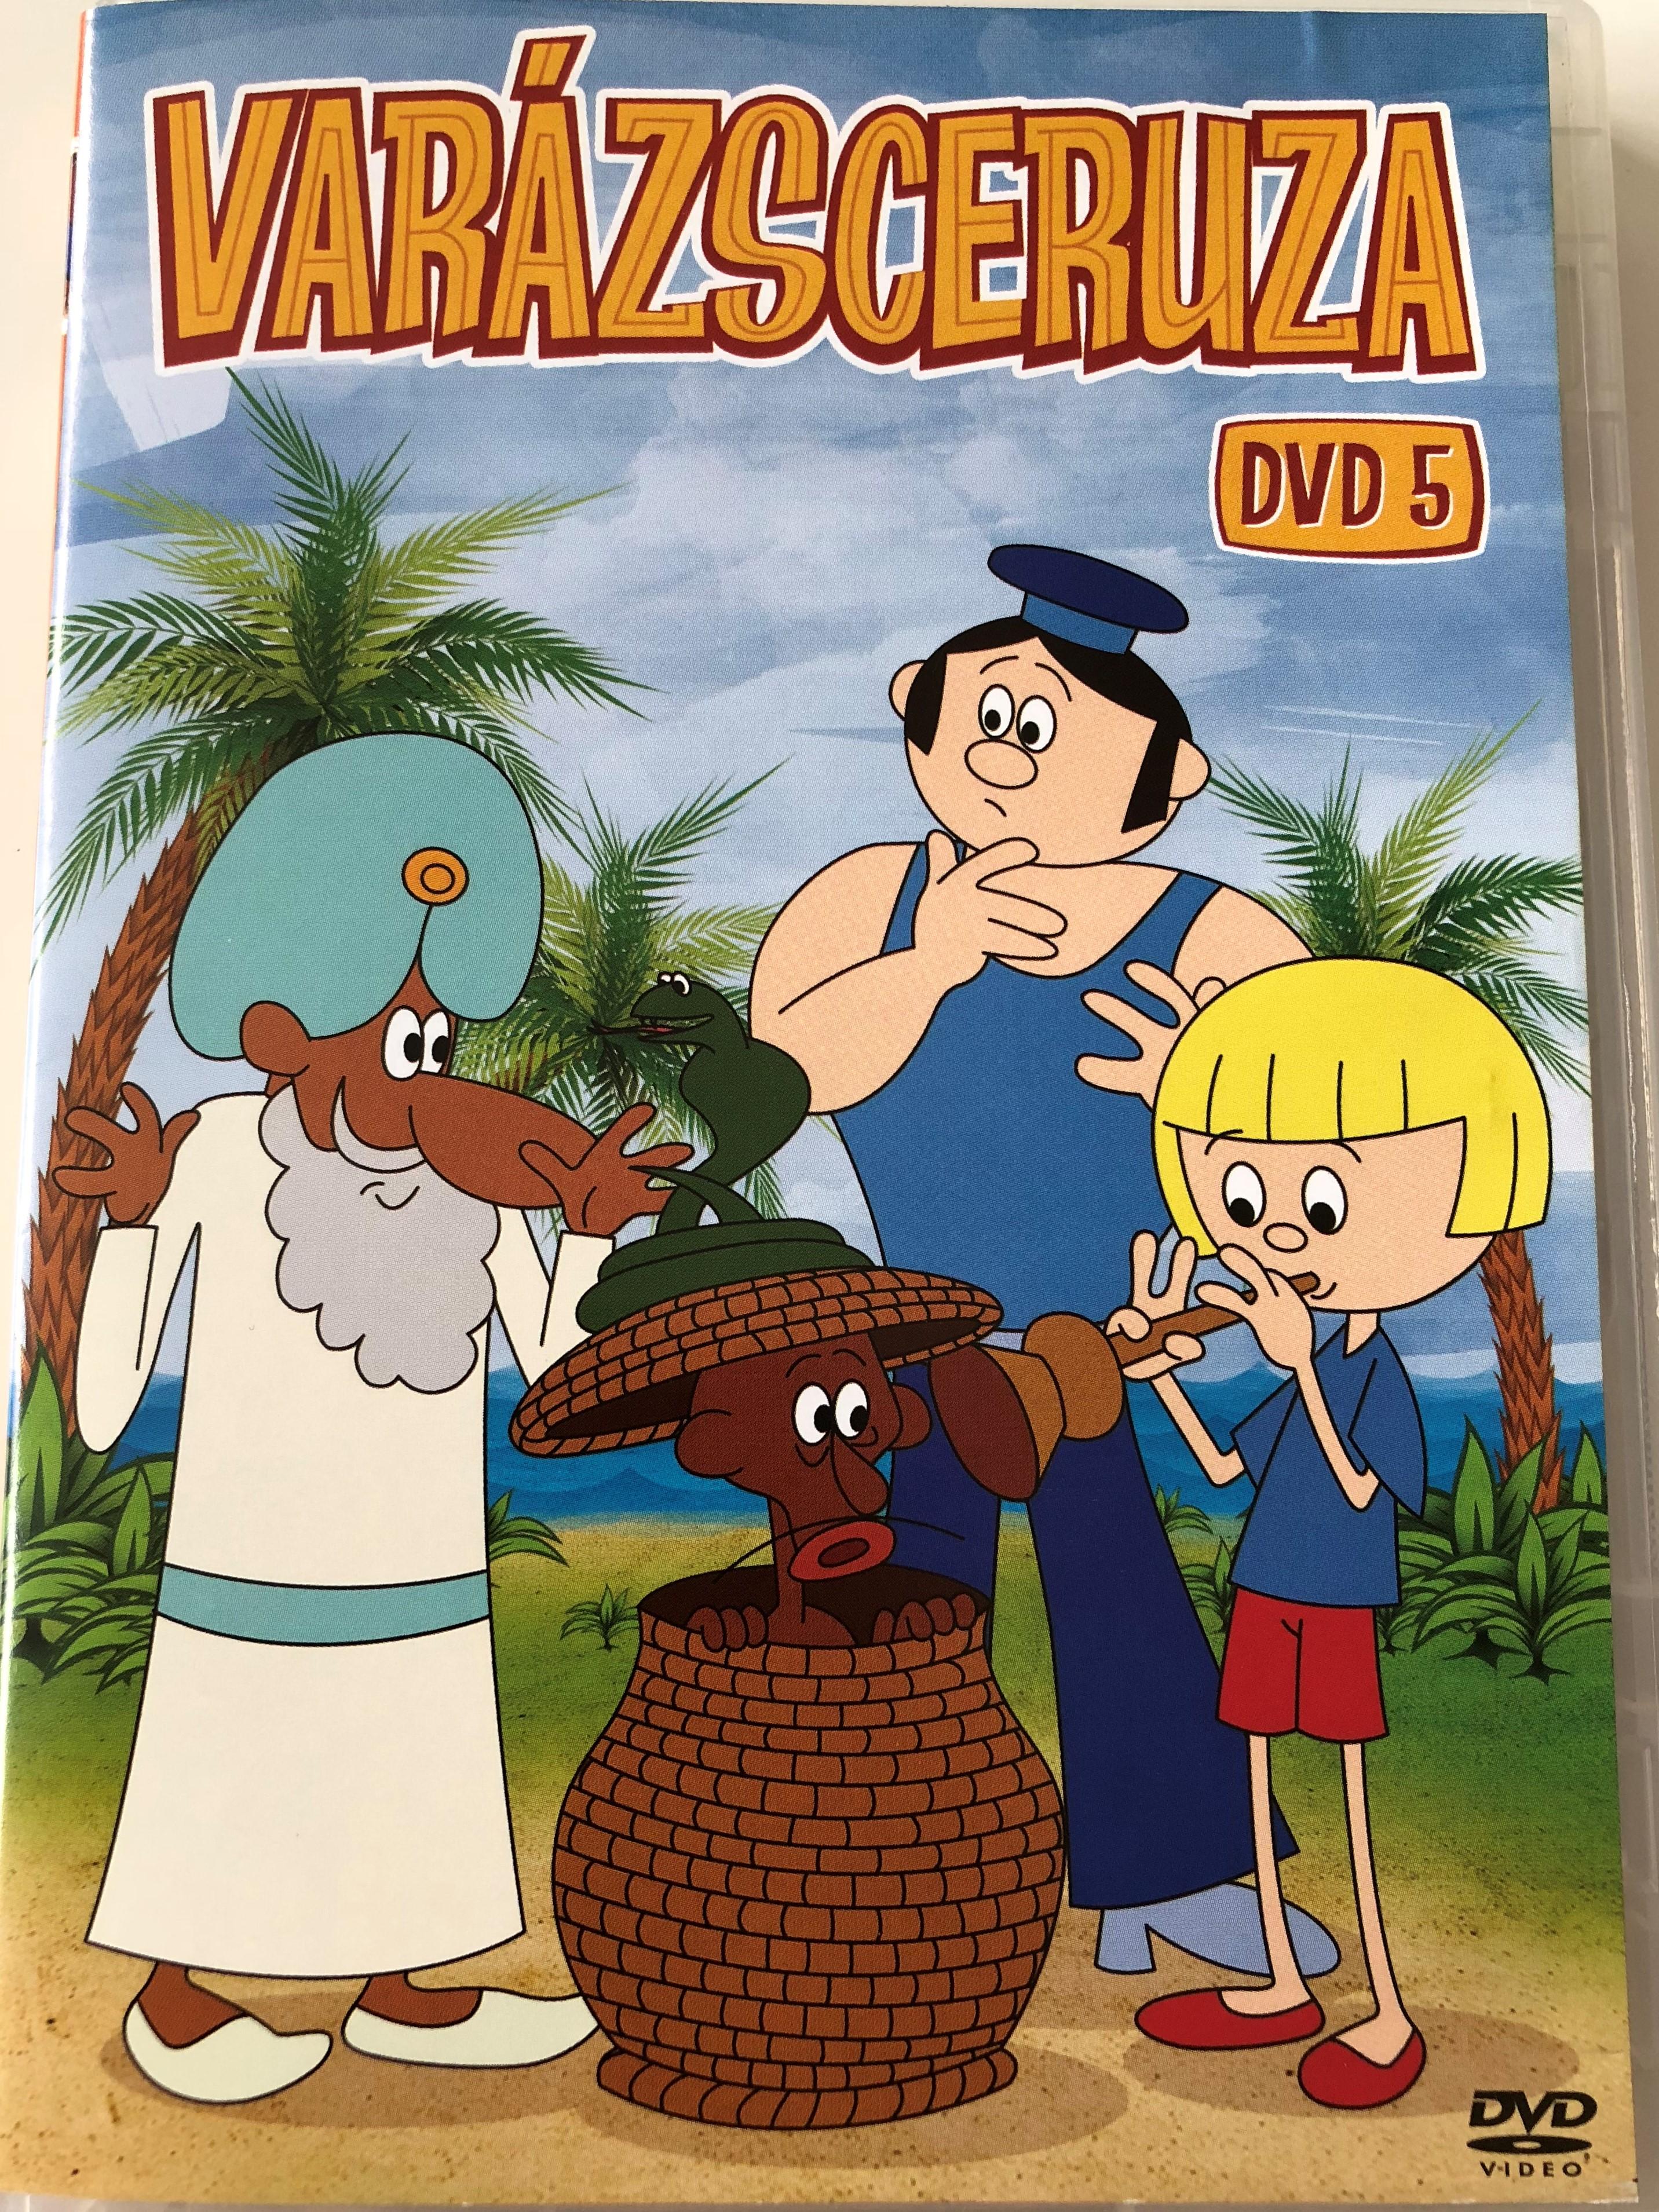 zaczarowany-o-wek-5.-dvd-1970-var-zsceruza-5.-written-by-adam-ochocki-enchanted-pencil-classic-polish-cartoon-series-7-episodes-on-disc-1-.jpg